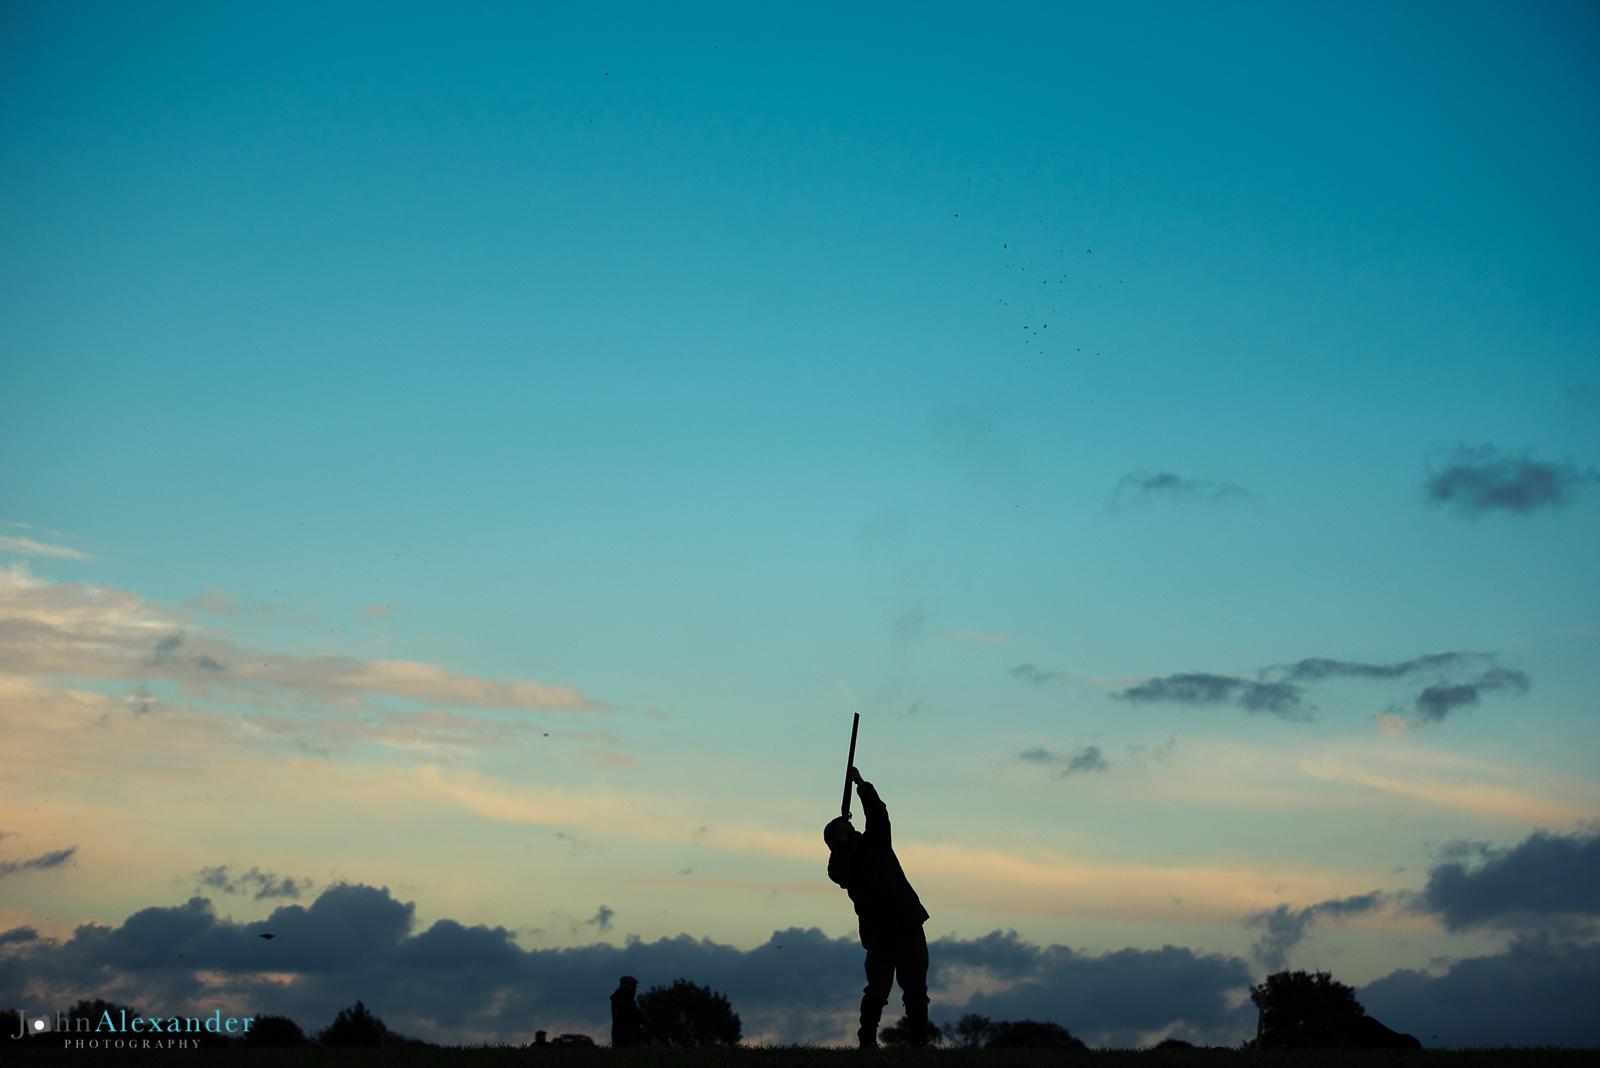 Silhouette of a gun aiming high into a blue sky